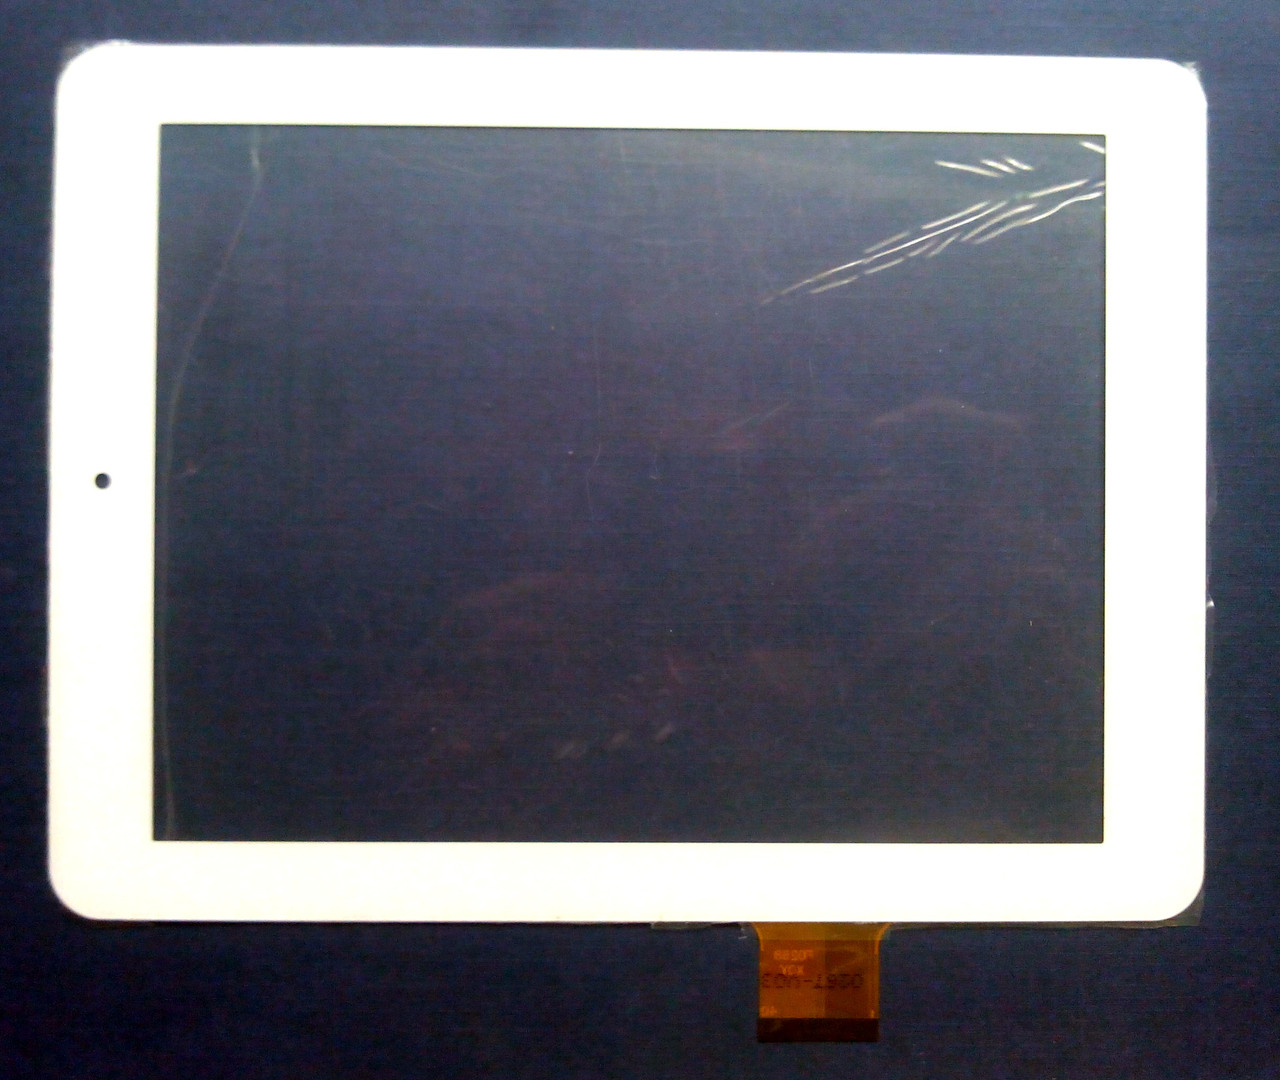 Touch (тач)  Teclast P88, RAECE F0268 XDY